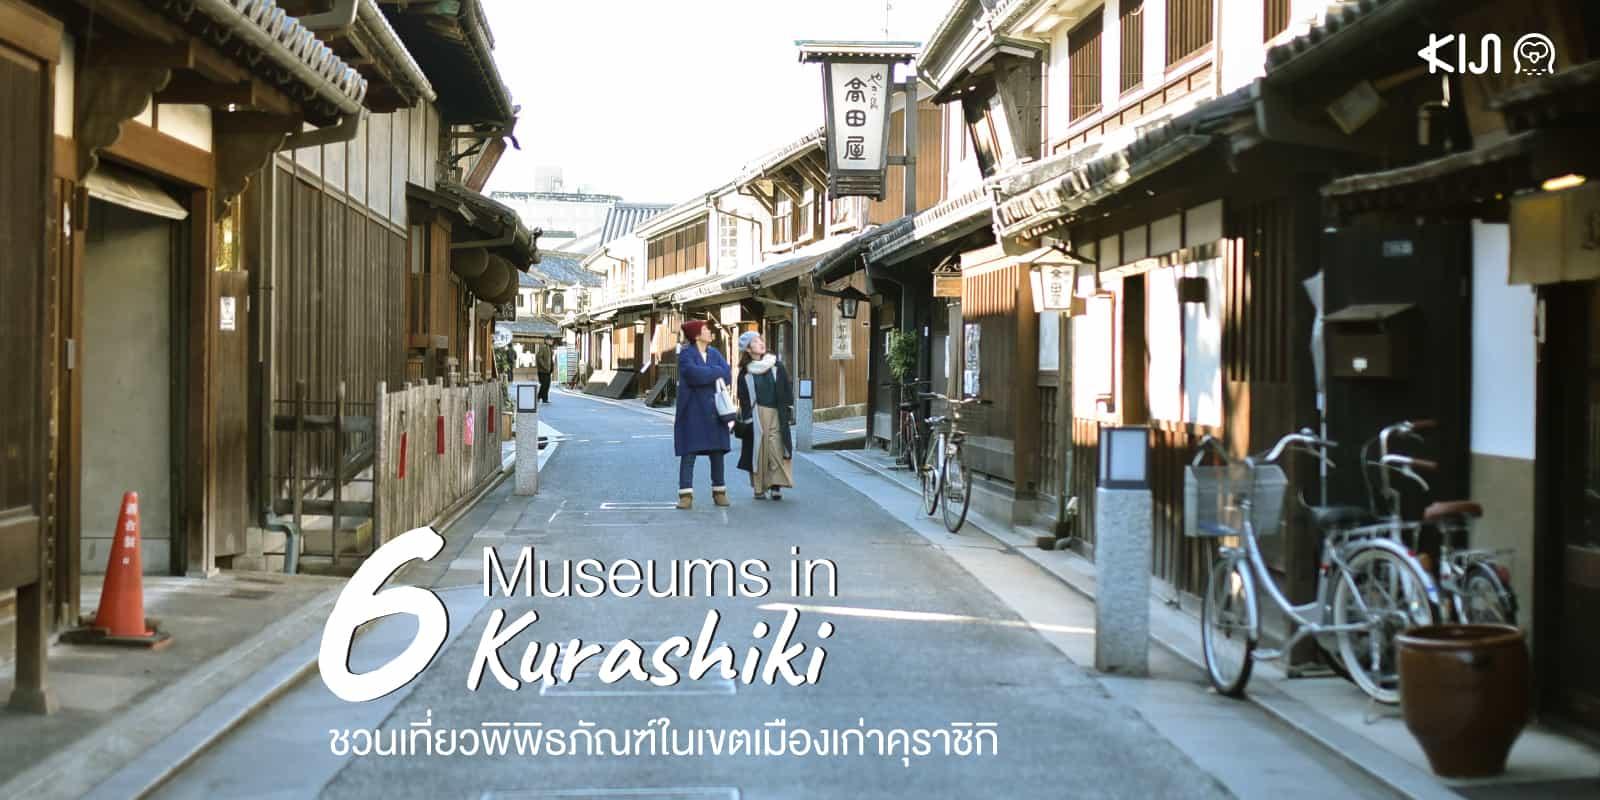 6 Museums in Kurashiki : ชวนเที่ยวพิพิธภัณฑ์ในเขตเมืองเก่าคุราชิกิ